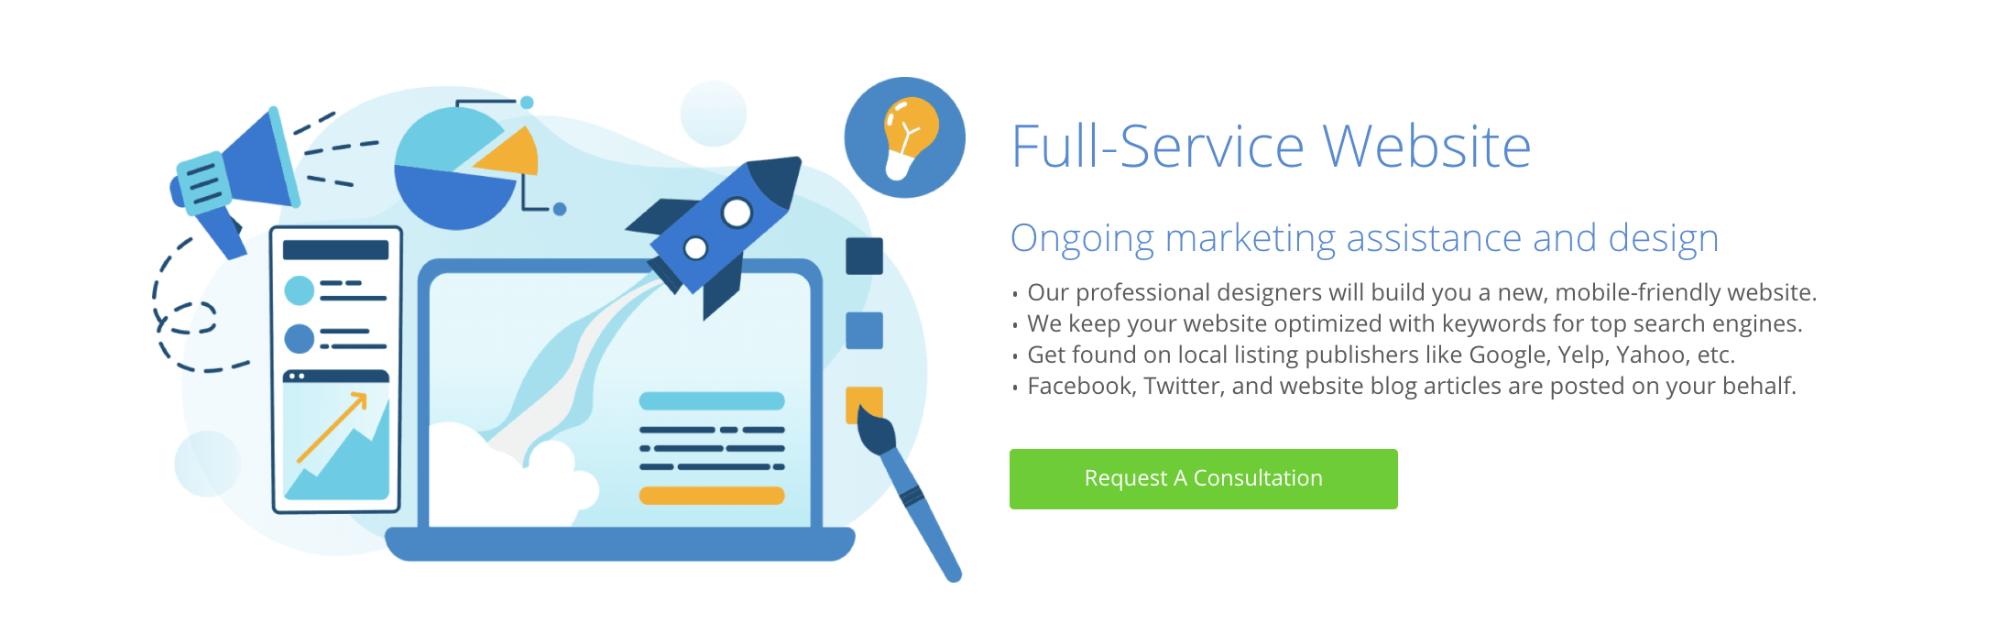 bluehost full service website